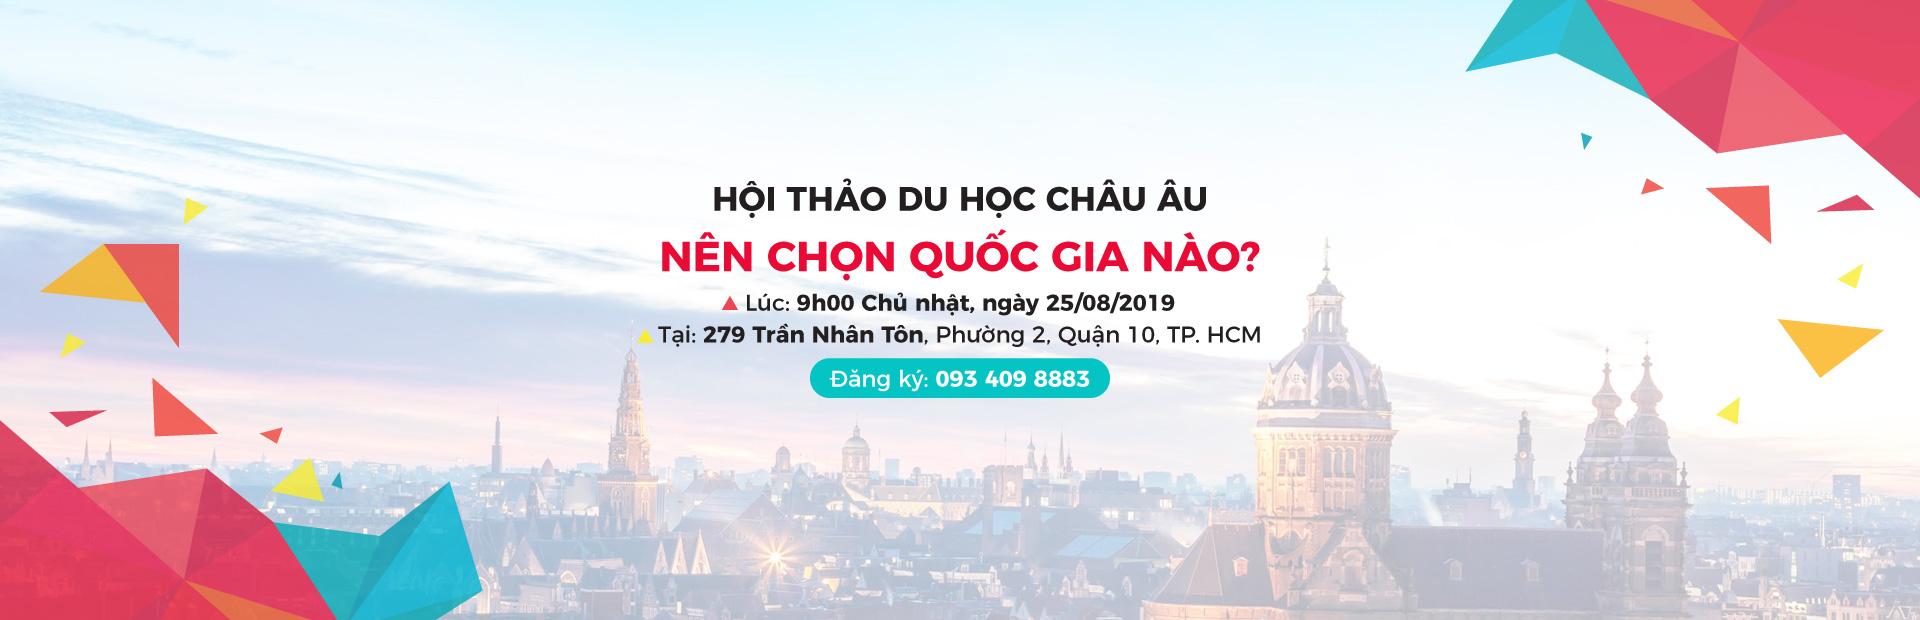 HT Chau Au